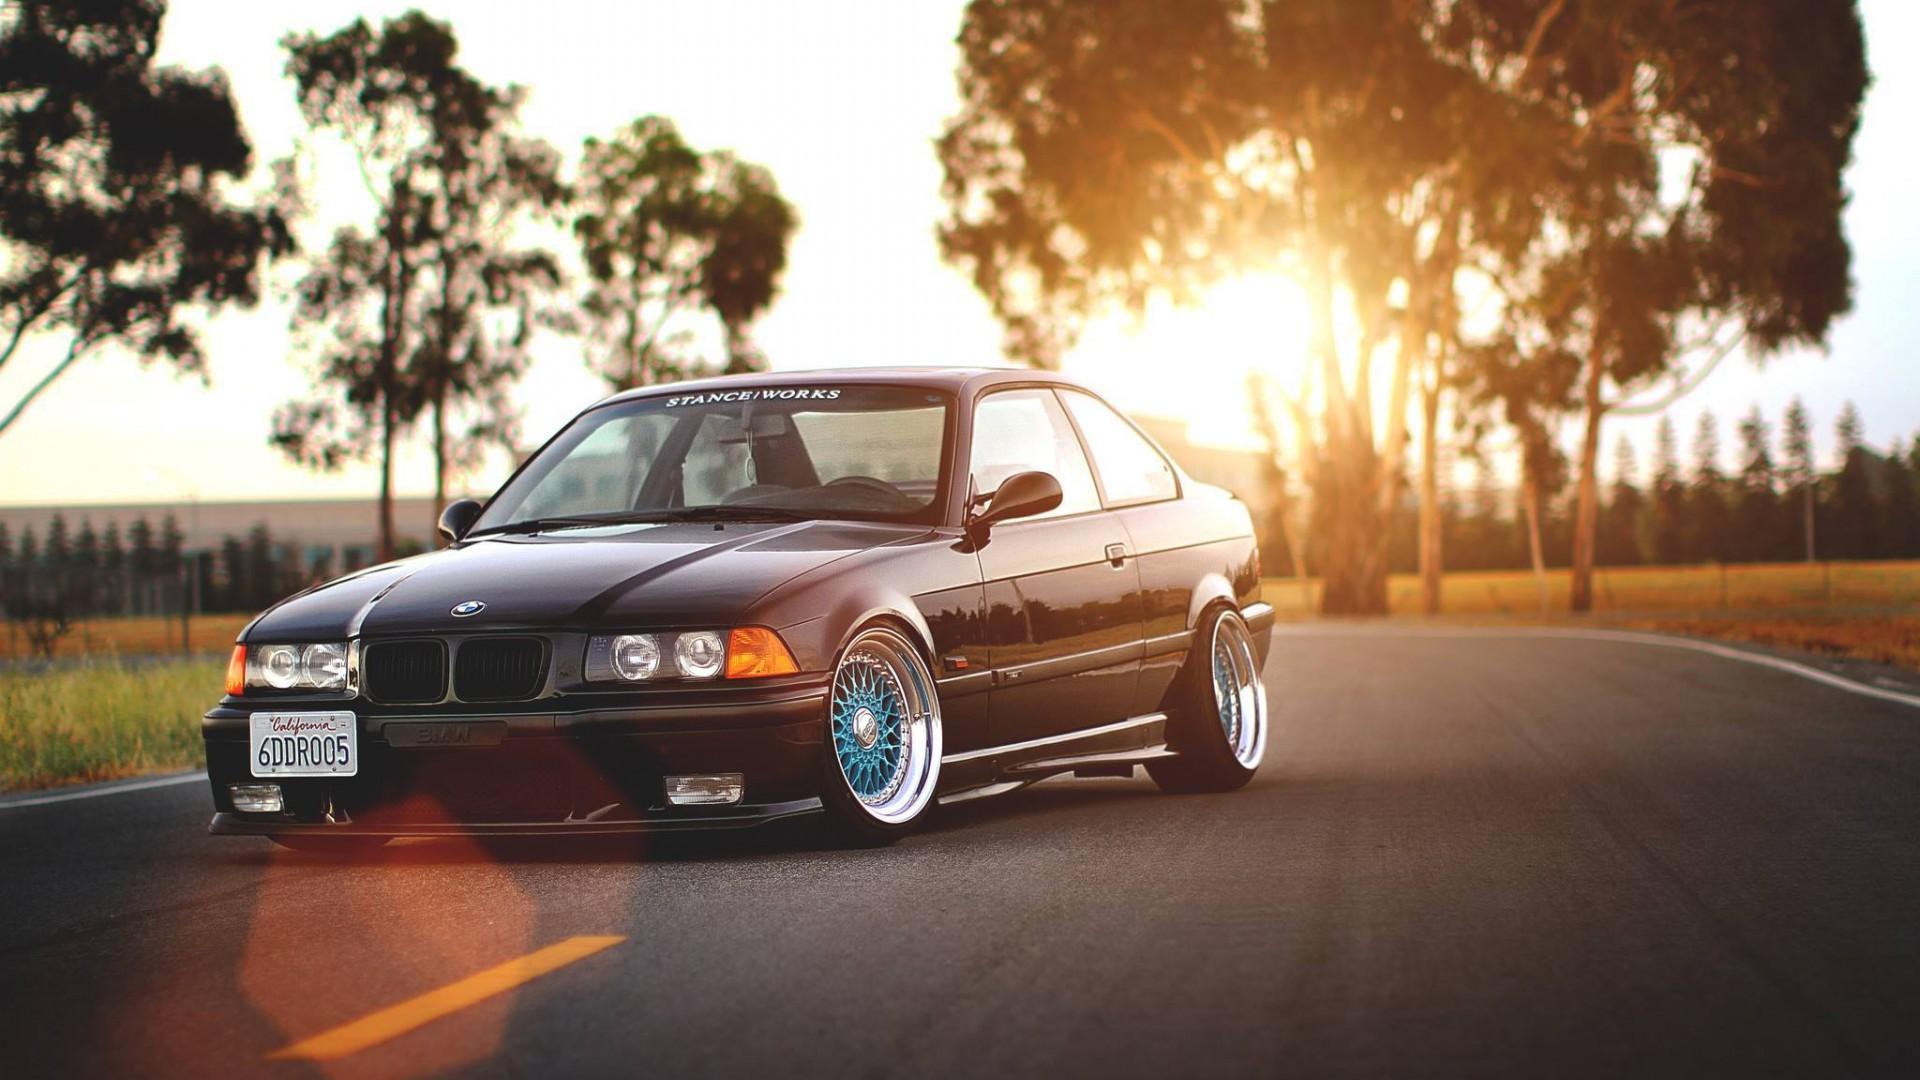 BMW E36 Wallpapers HD 1920x1080